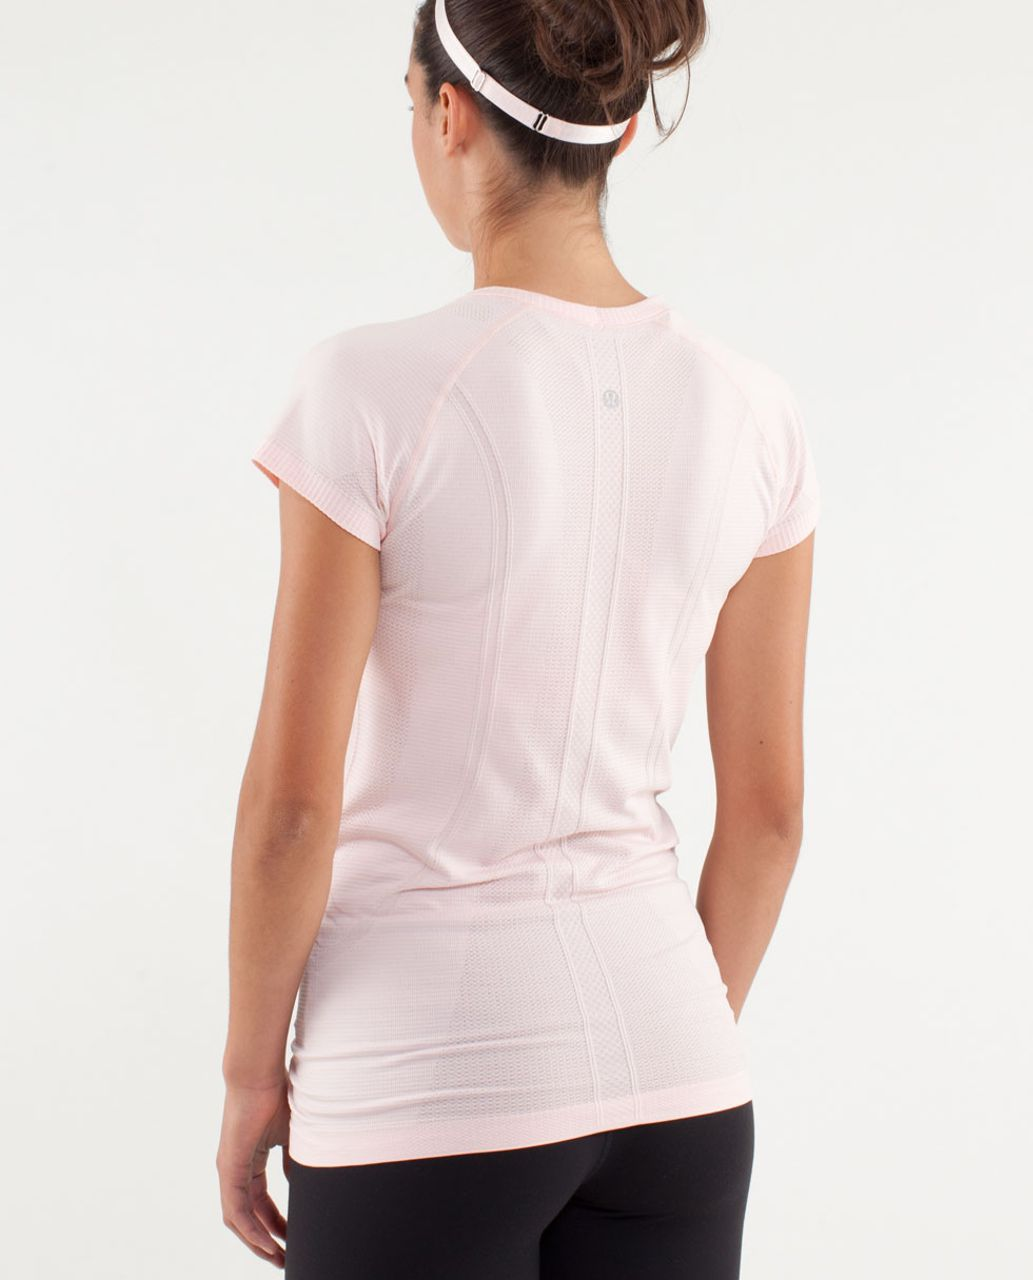 Lululemon Run:  Swiftly Tech Short Sleeve - Pretty Pink